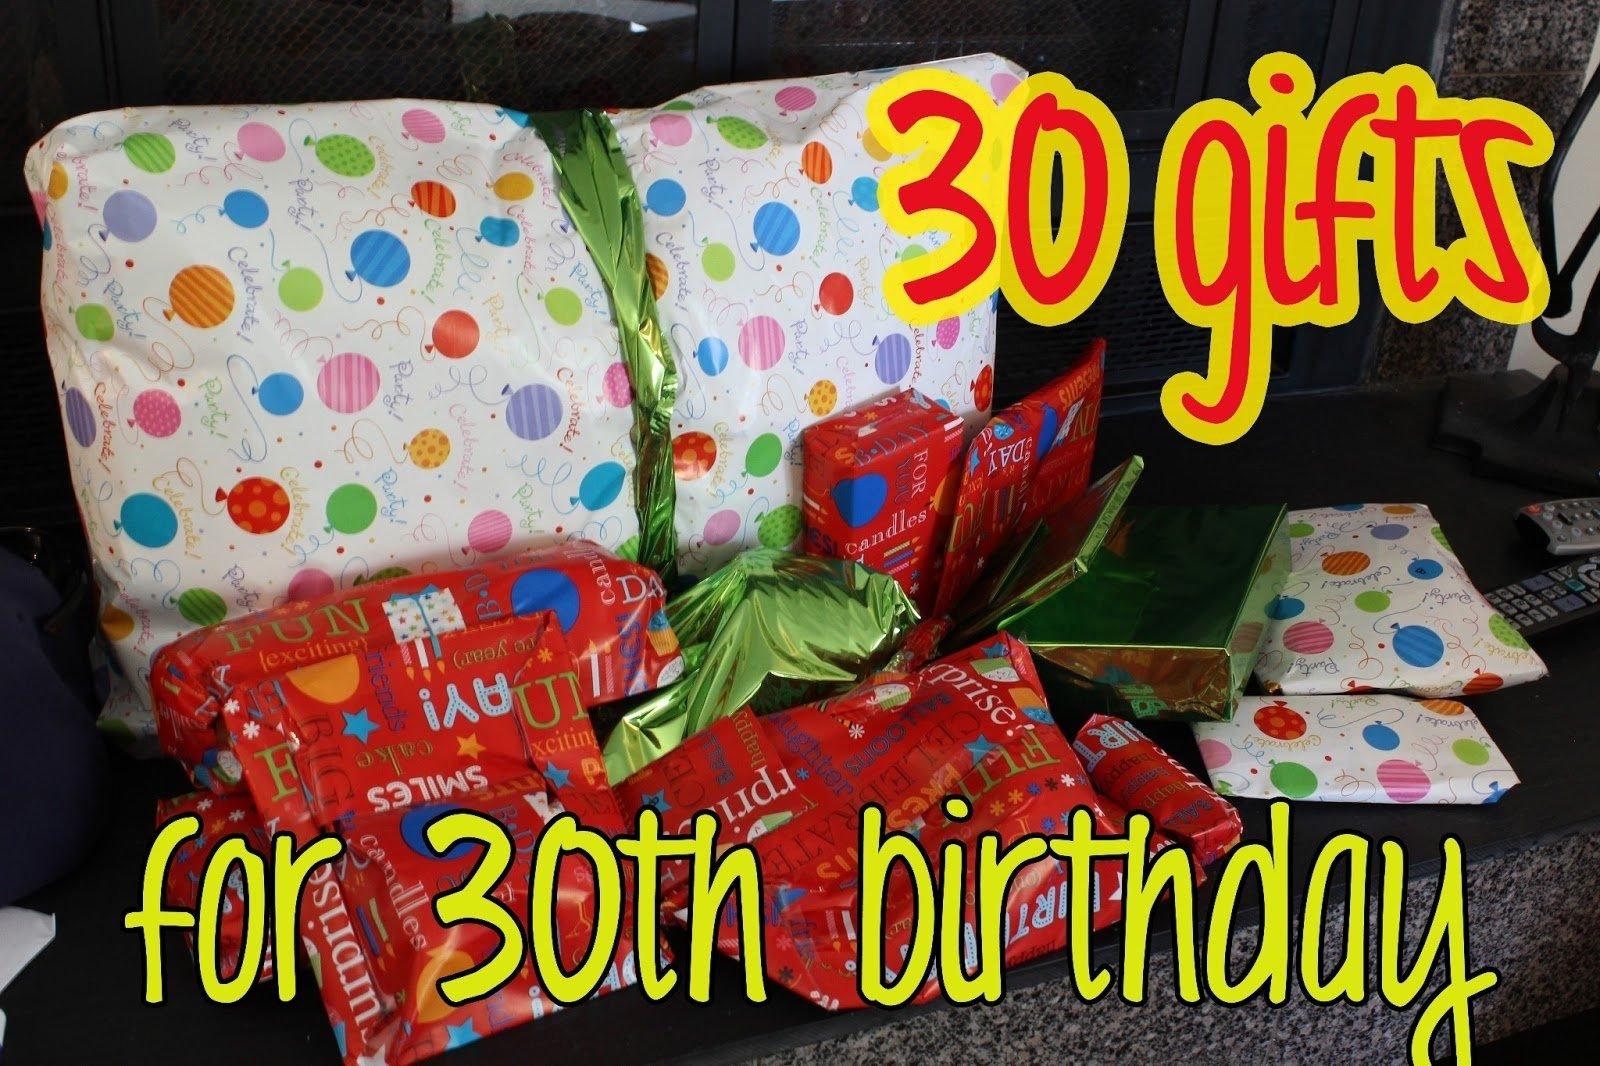 10 Amazing Creative Birthday Ideas For Husband love elizabethany gift idea 30 gifts for 30th birthday